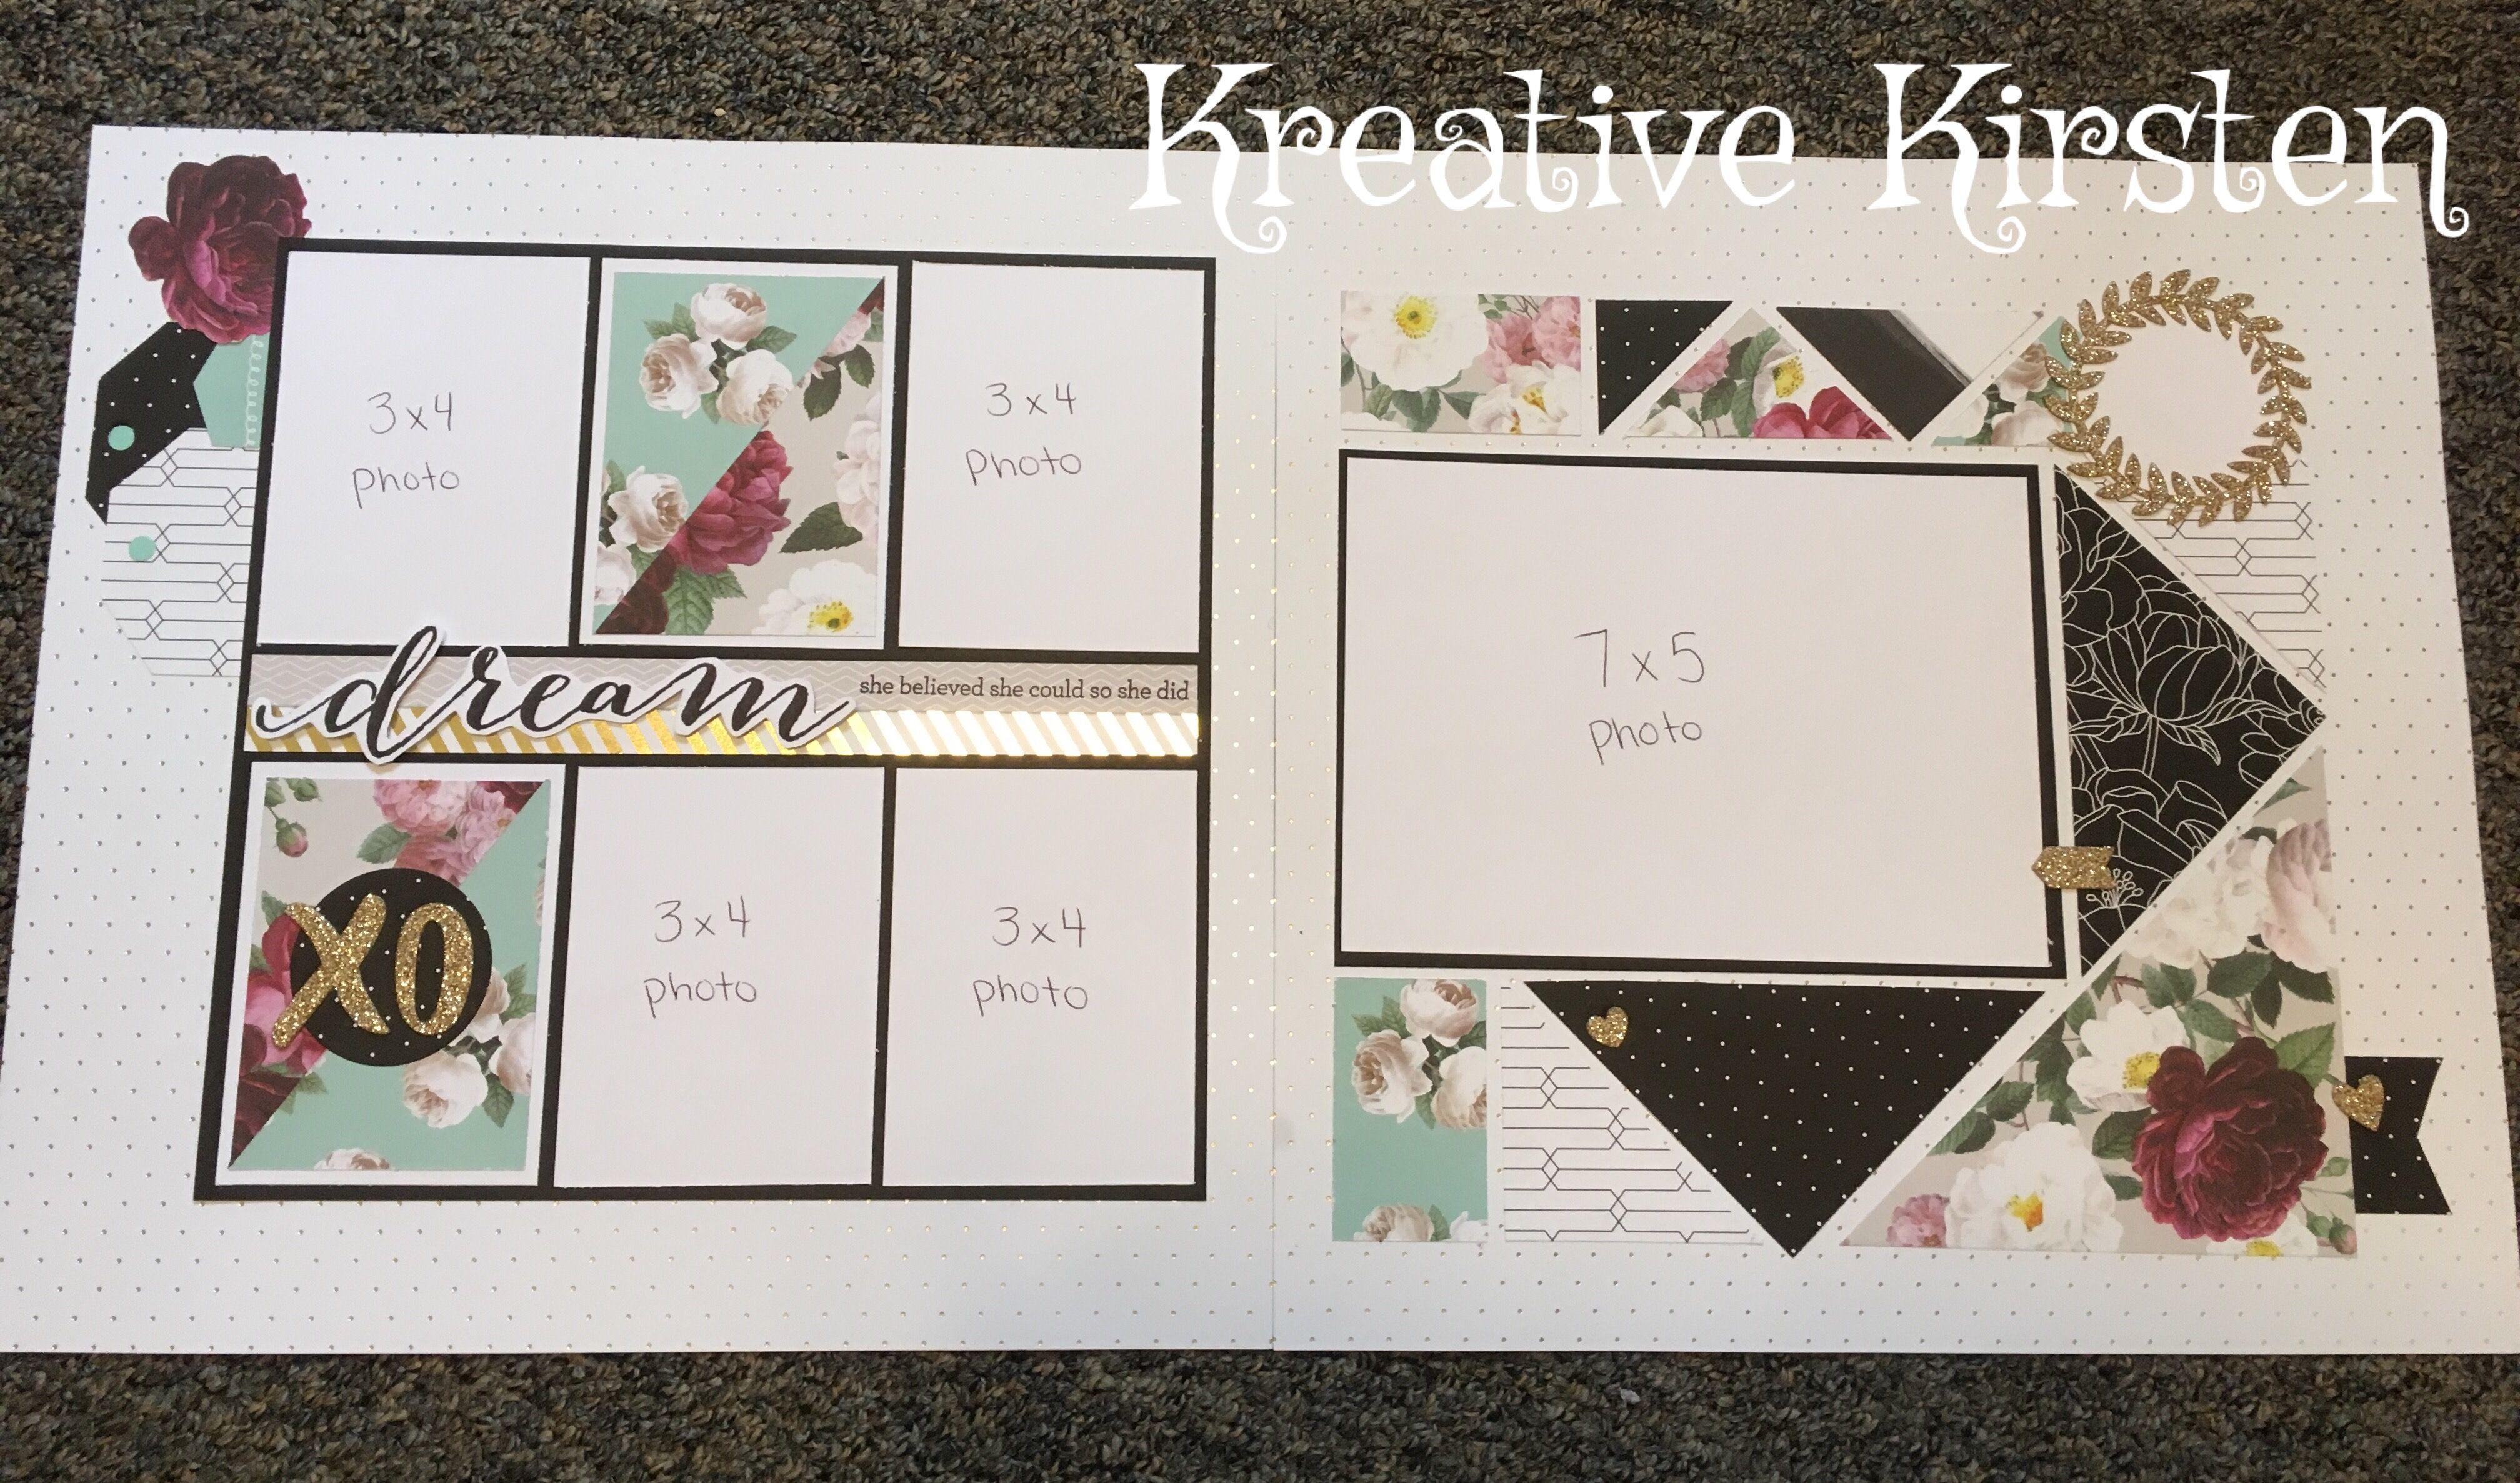 How to scrapbook a wedding invitation - Scrapbook Sketches